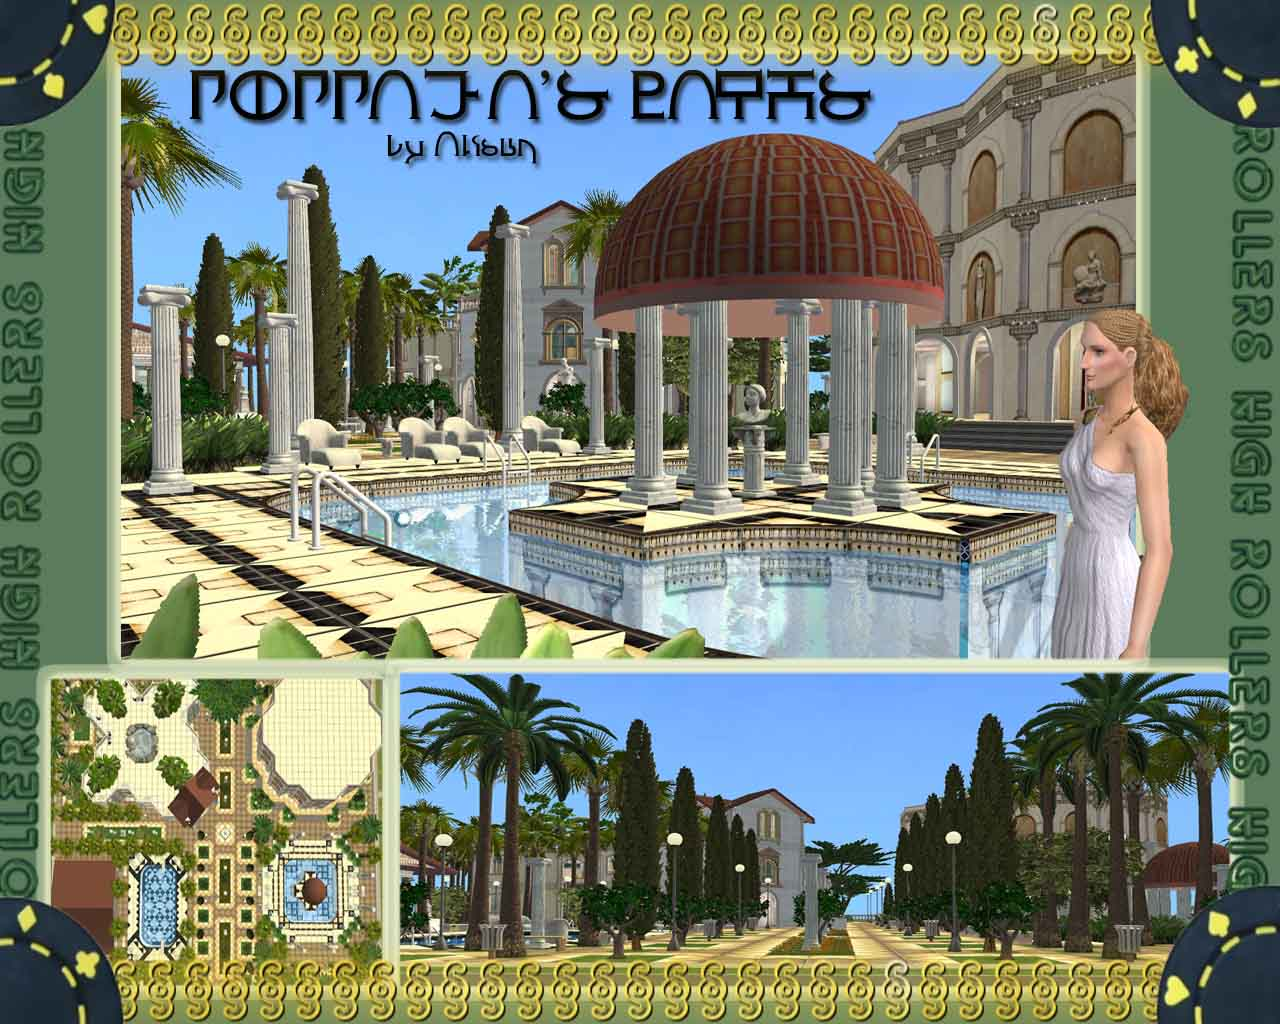 Mod The Sims Poppaeas Baths 5 Stars SPA And Luxury